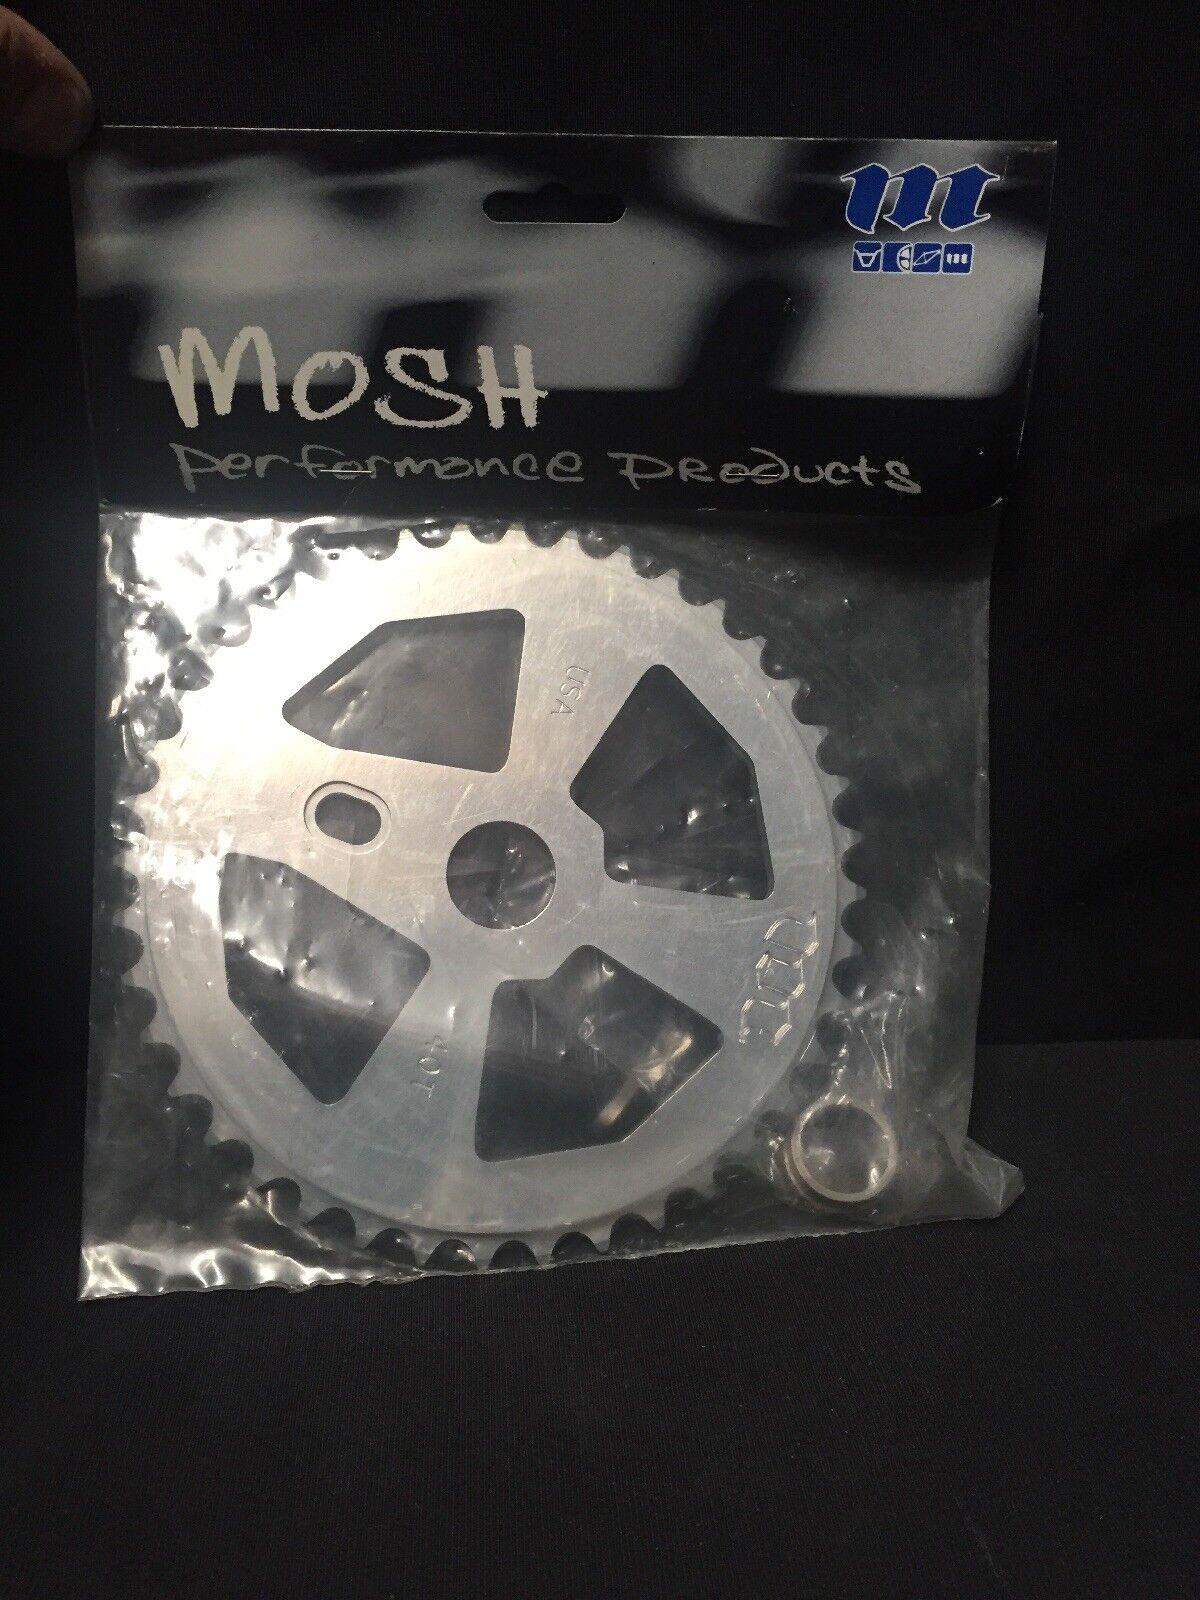 Nuevo viejo stock años 90 MOSH 40t Aleación CNC ChainWheel BMX Piñón Usa Expert XL Rave Pro Gt